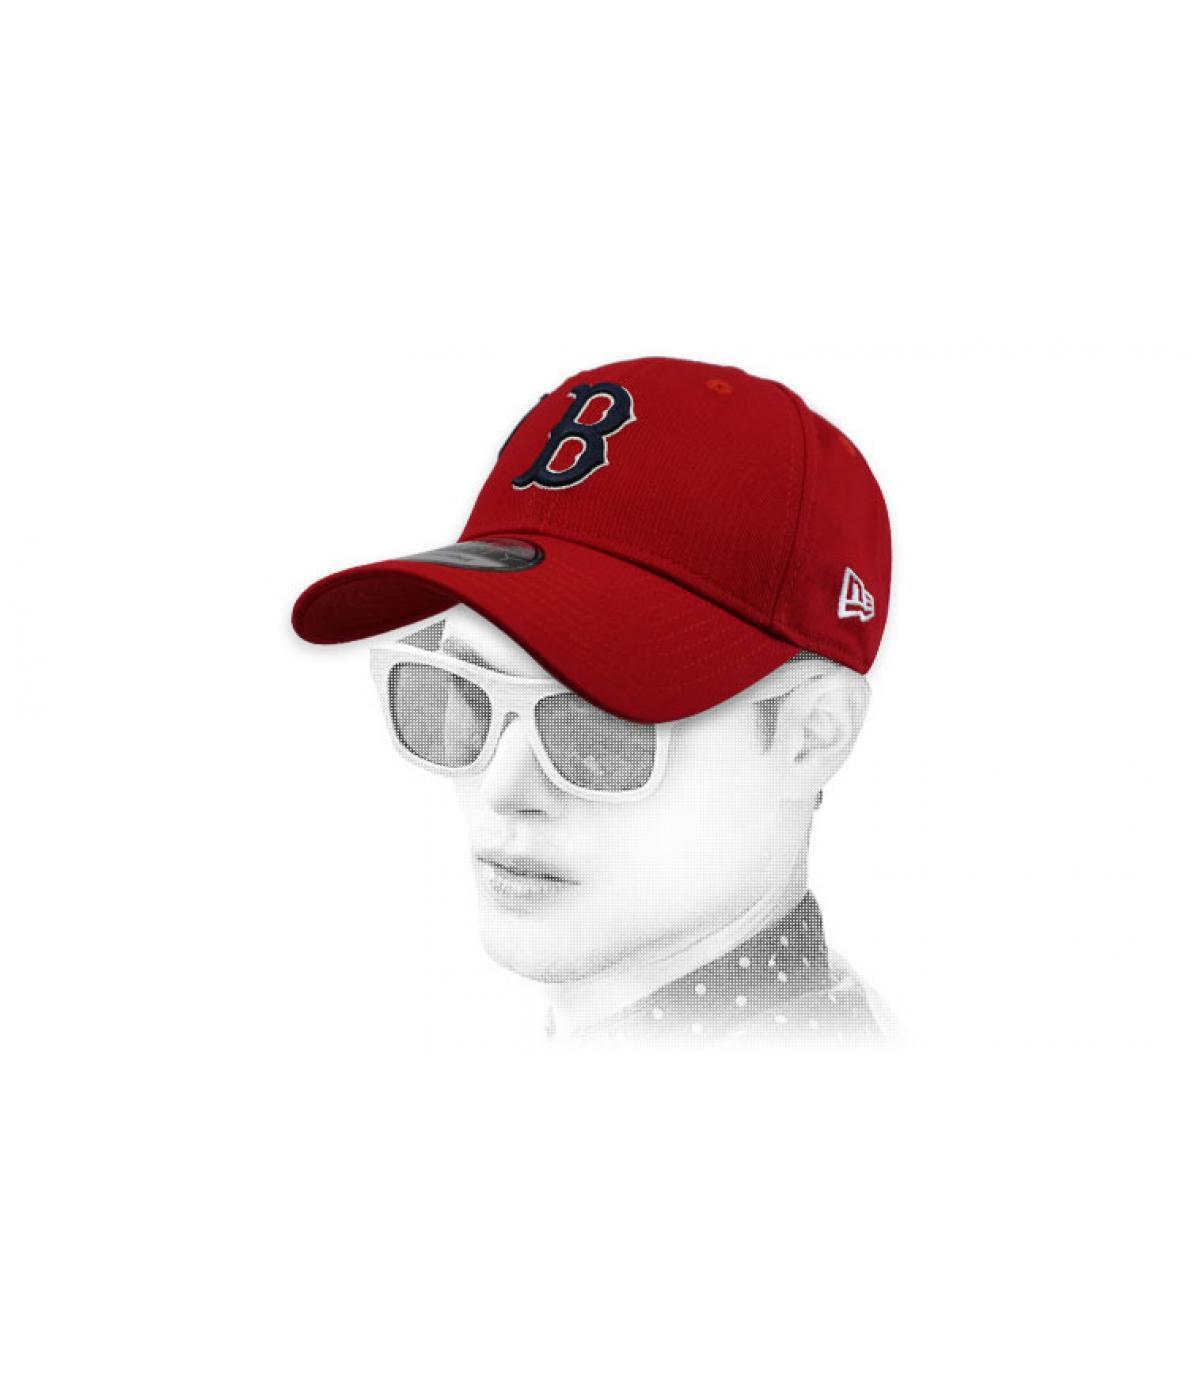 cap B rood